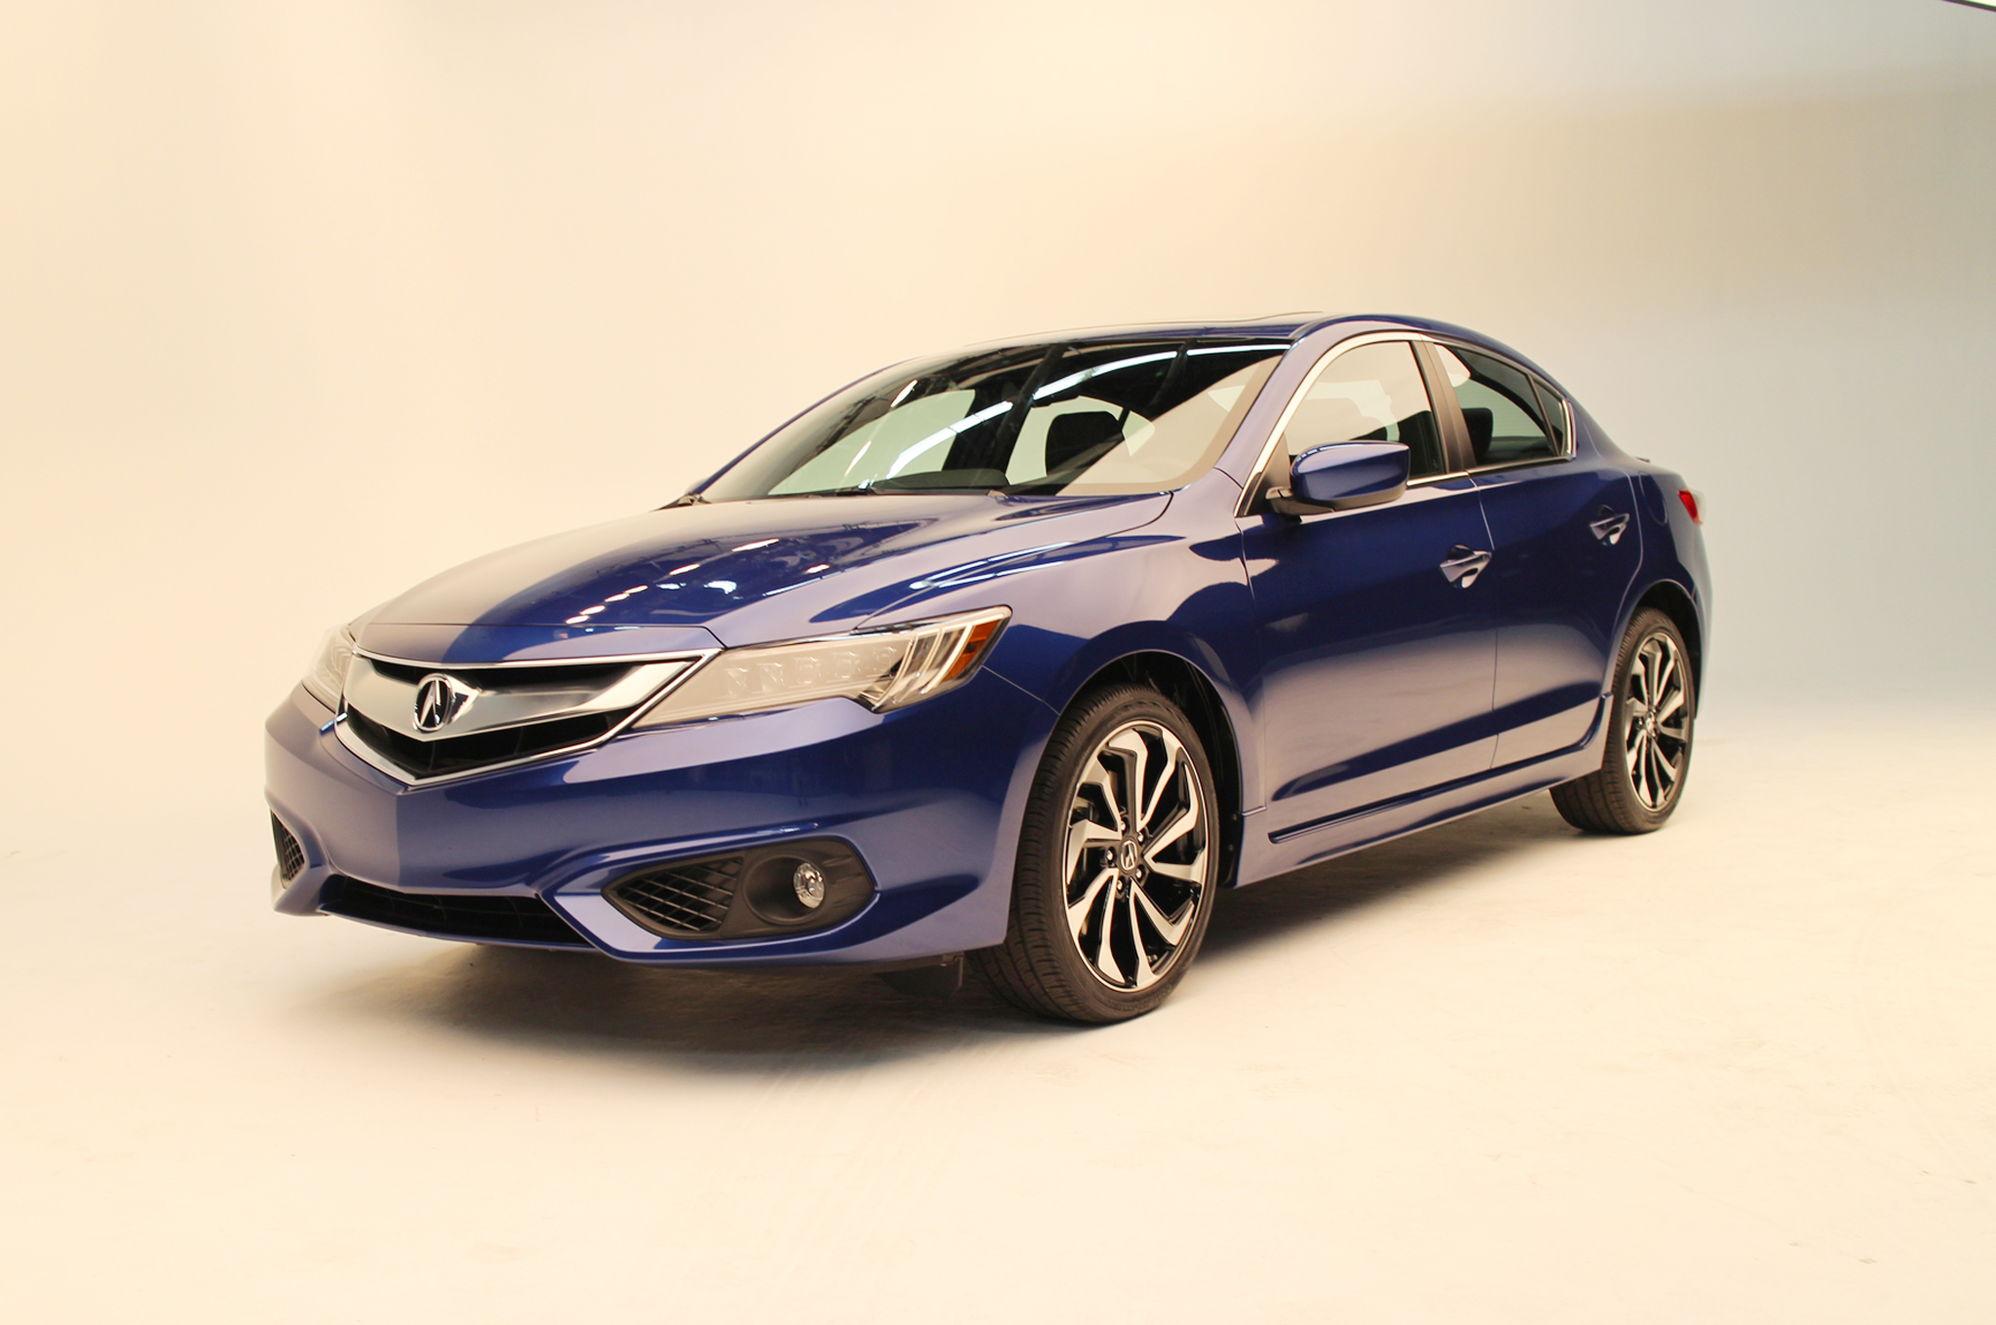 2016 Acura ILX MMC Reviews - Acura Forum : Acura Forums